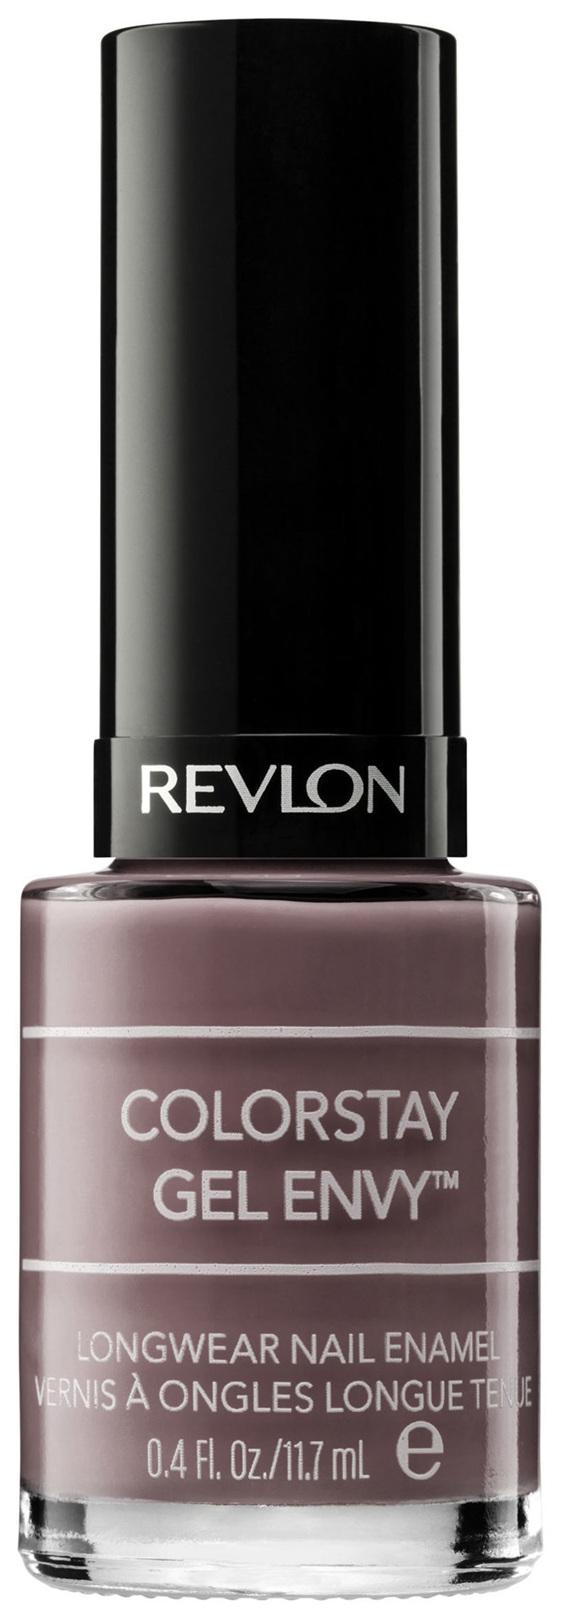 Revlon Colorstay Gel Envy™ Nail Enamel 2 Of A Kind